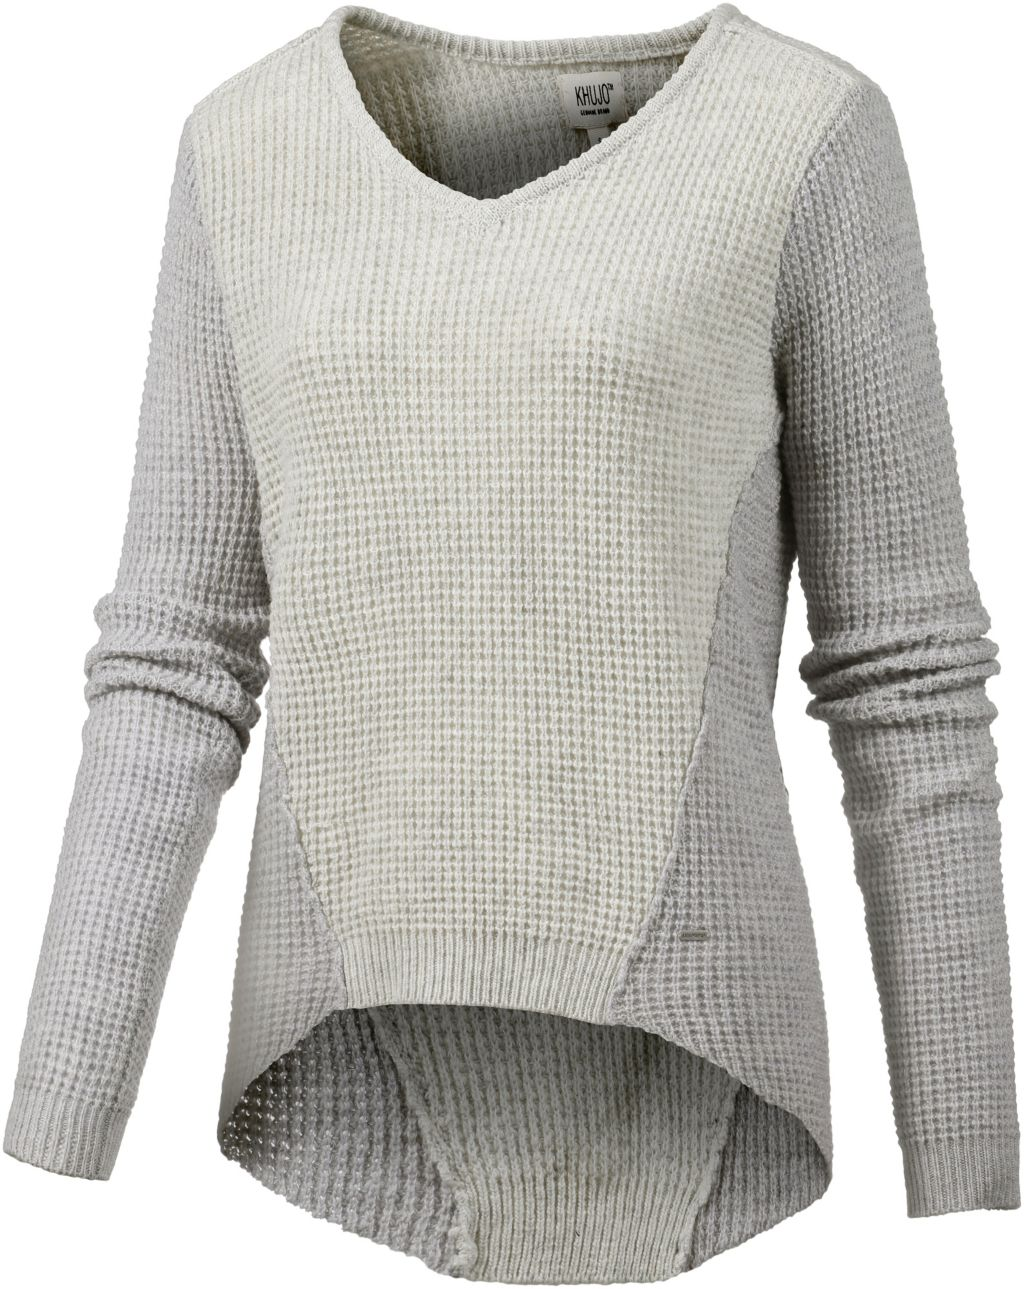 V-Pullover Damen in grau, Größe S